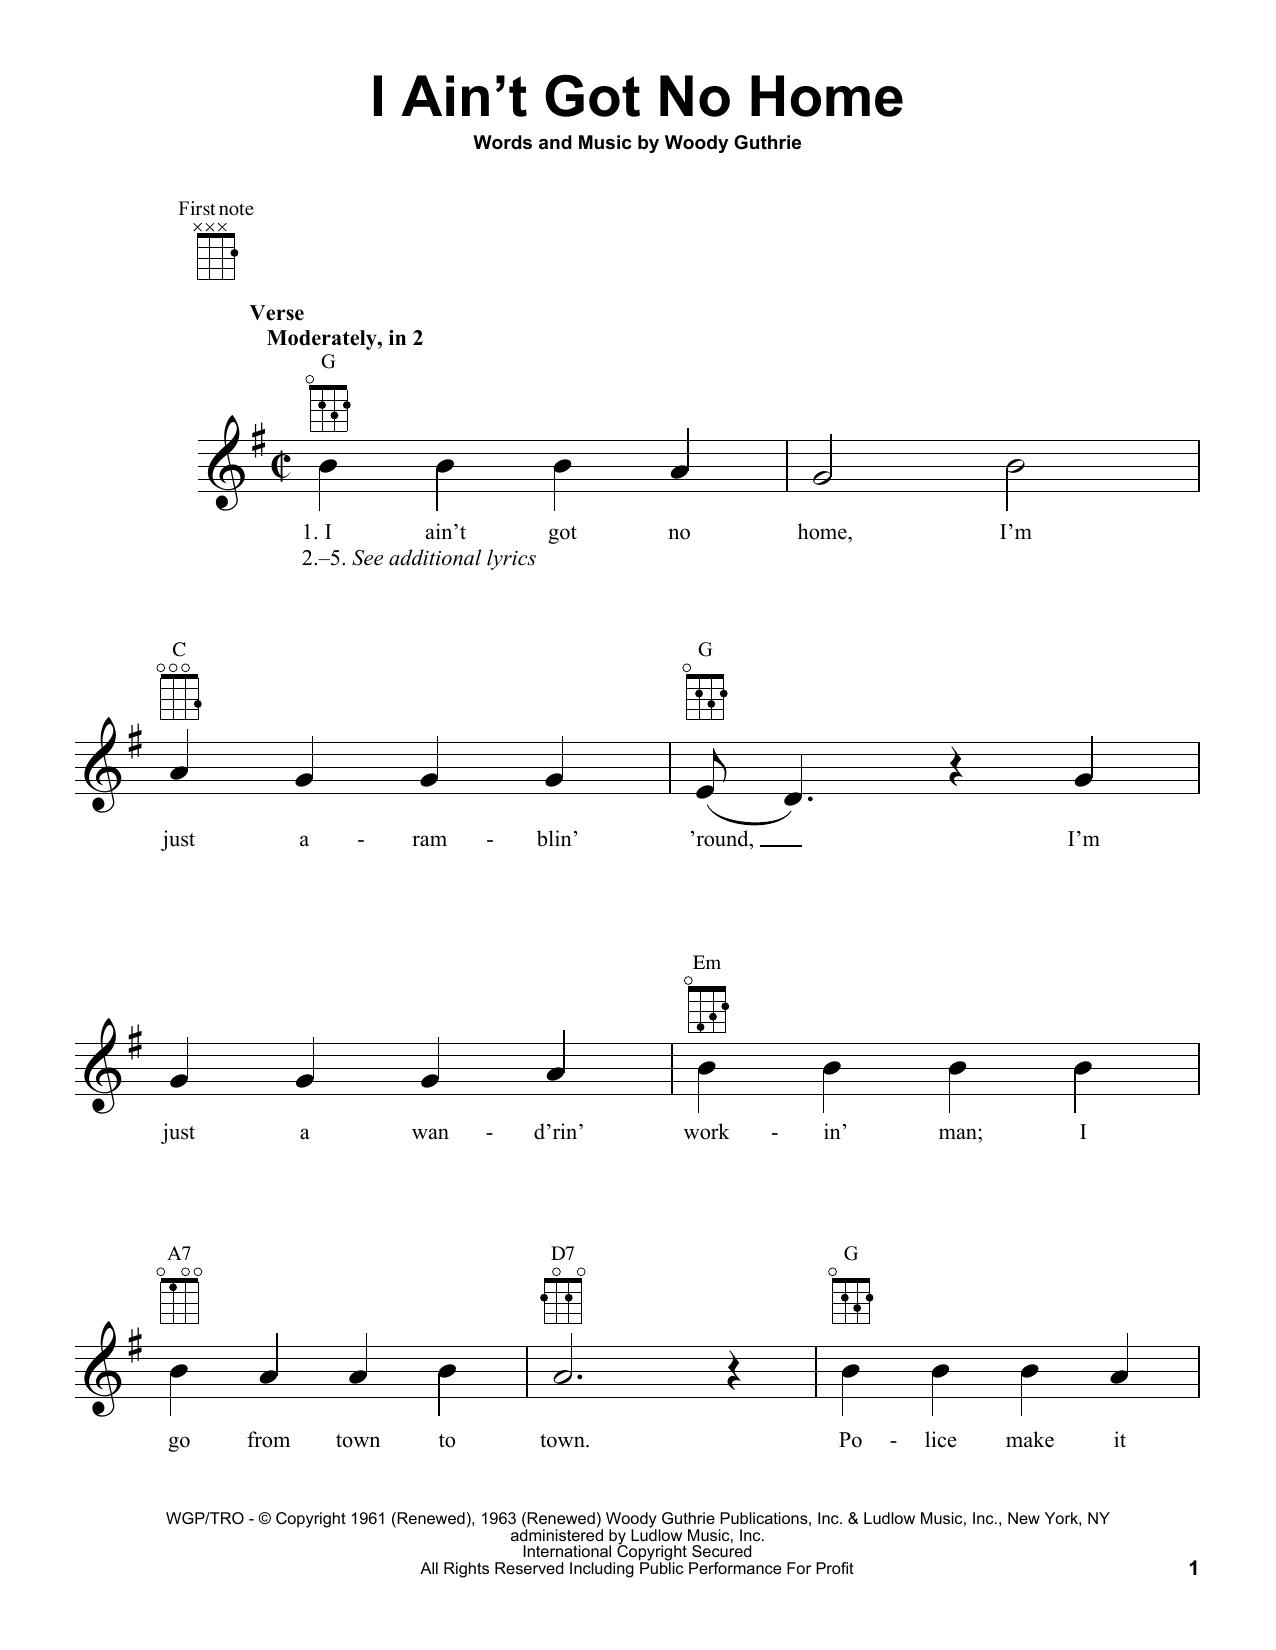 Tablature guitare I Ain't Got No Home de Woody Guthrie - Ukulele